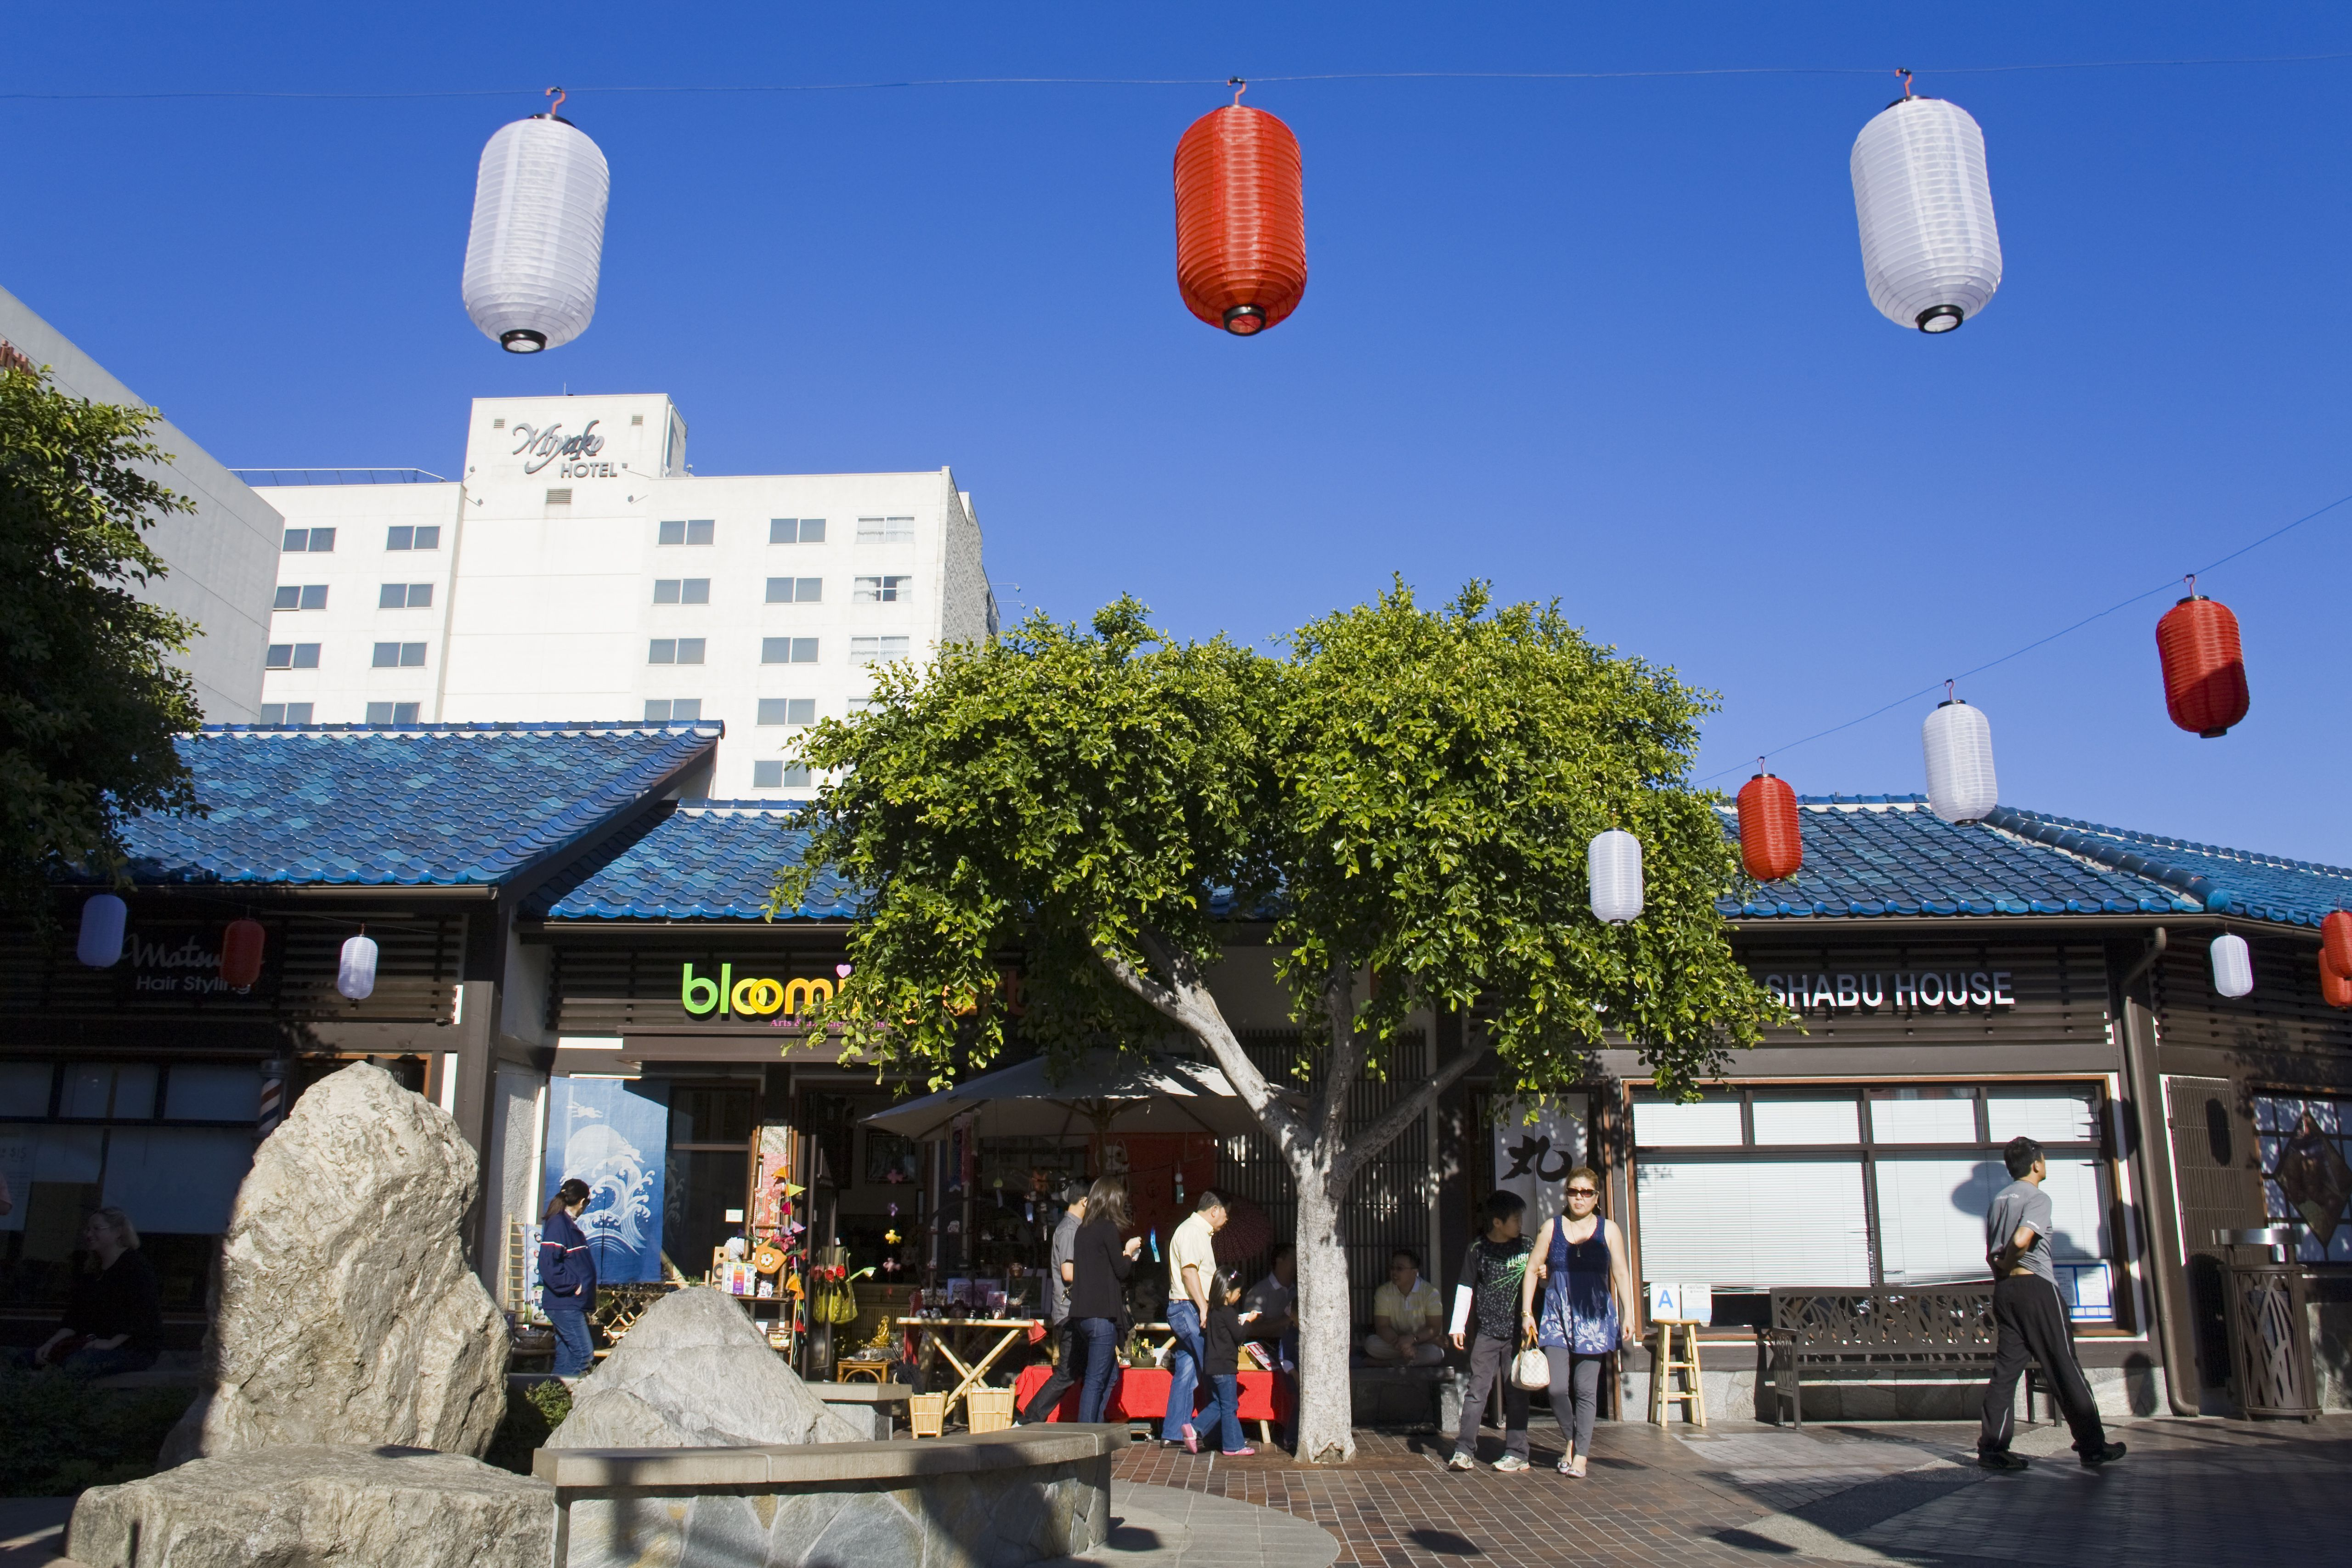 japanese village plaza in little tokyo 59e3cef2d963ac0011d79b21